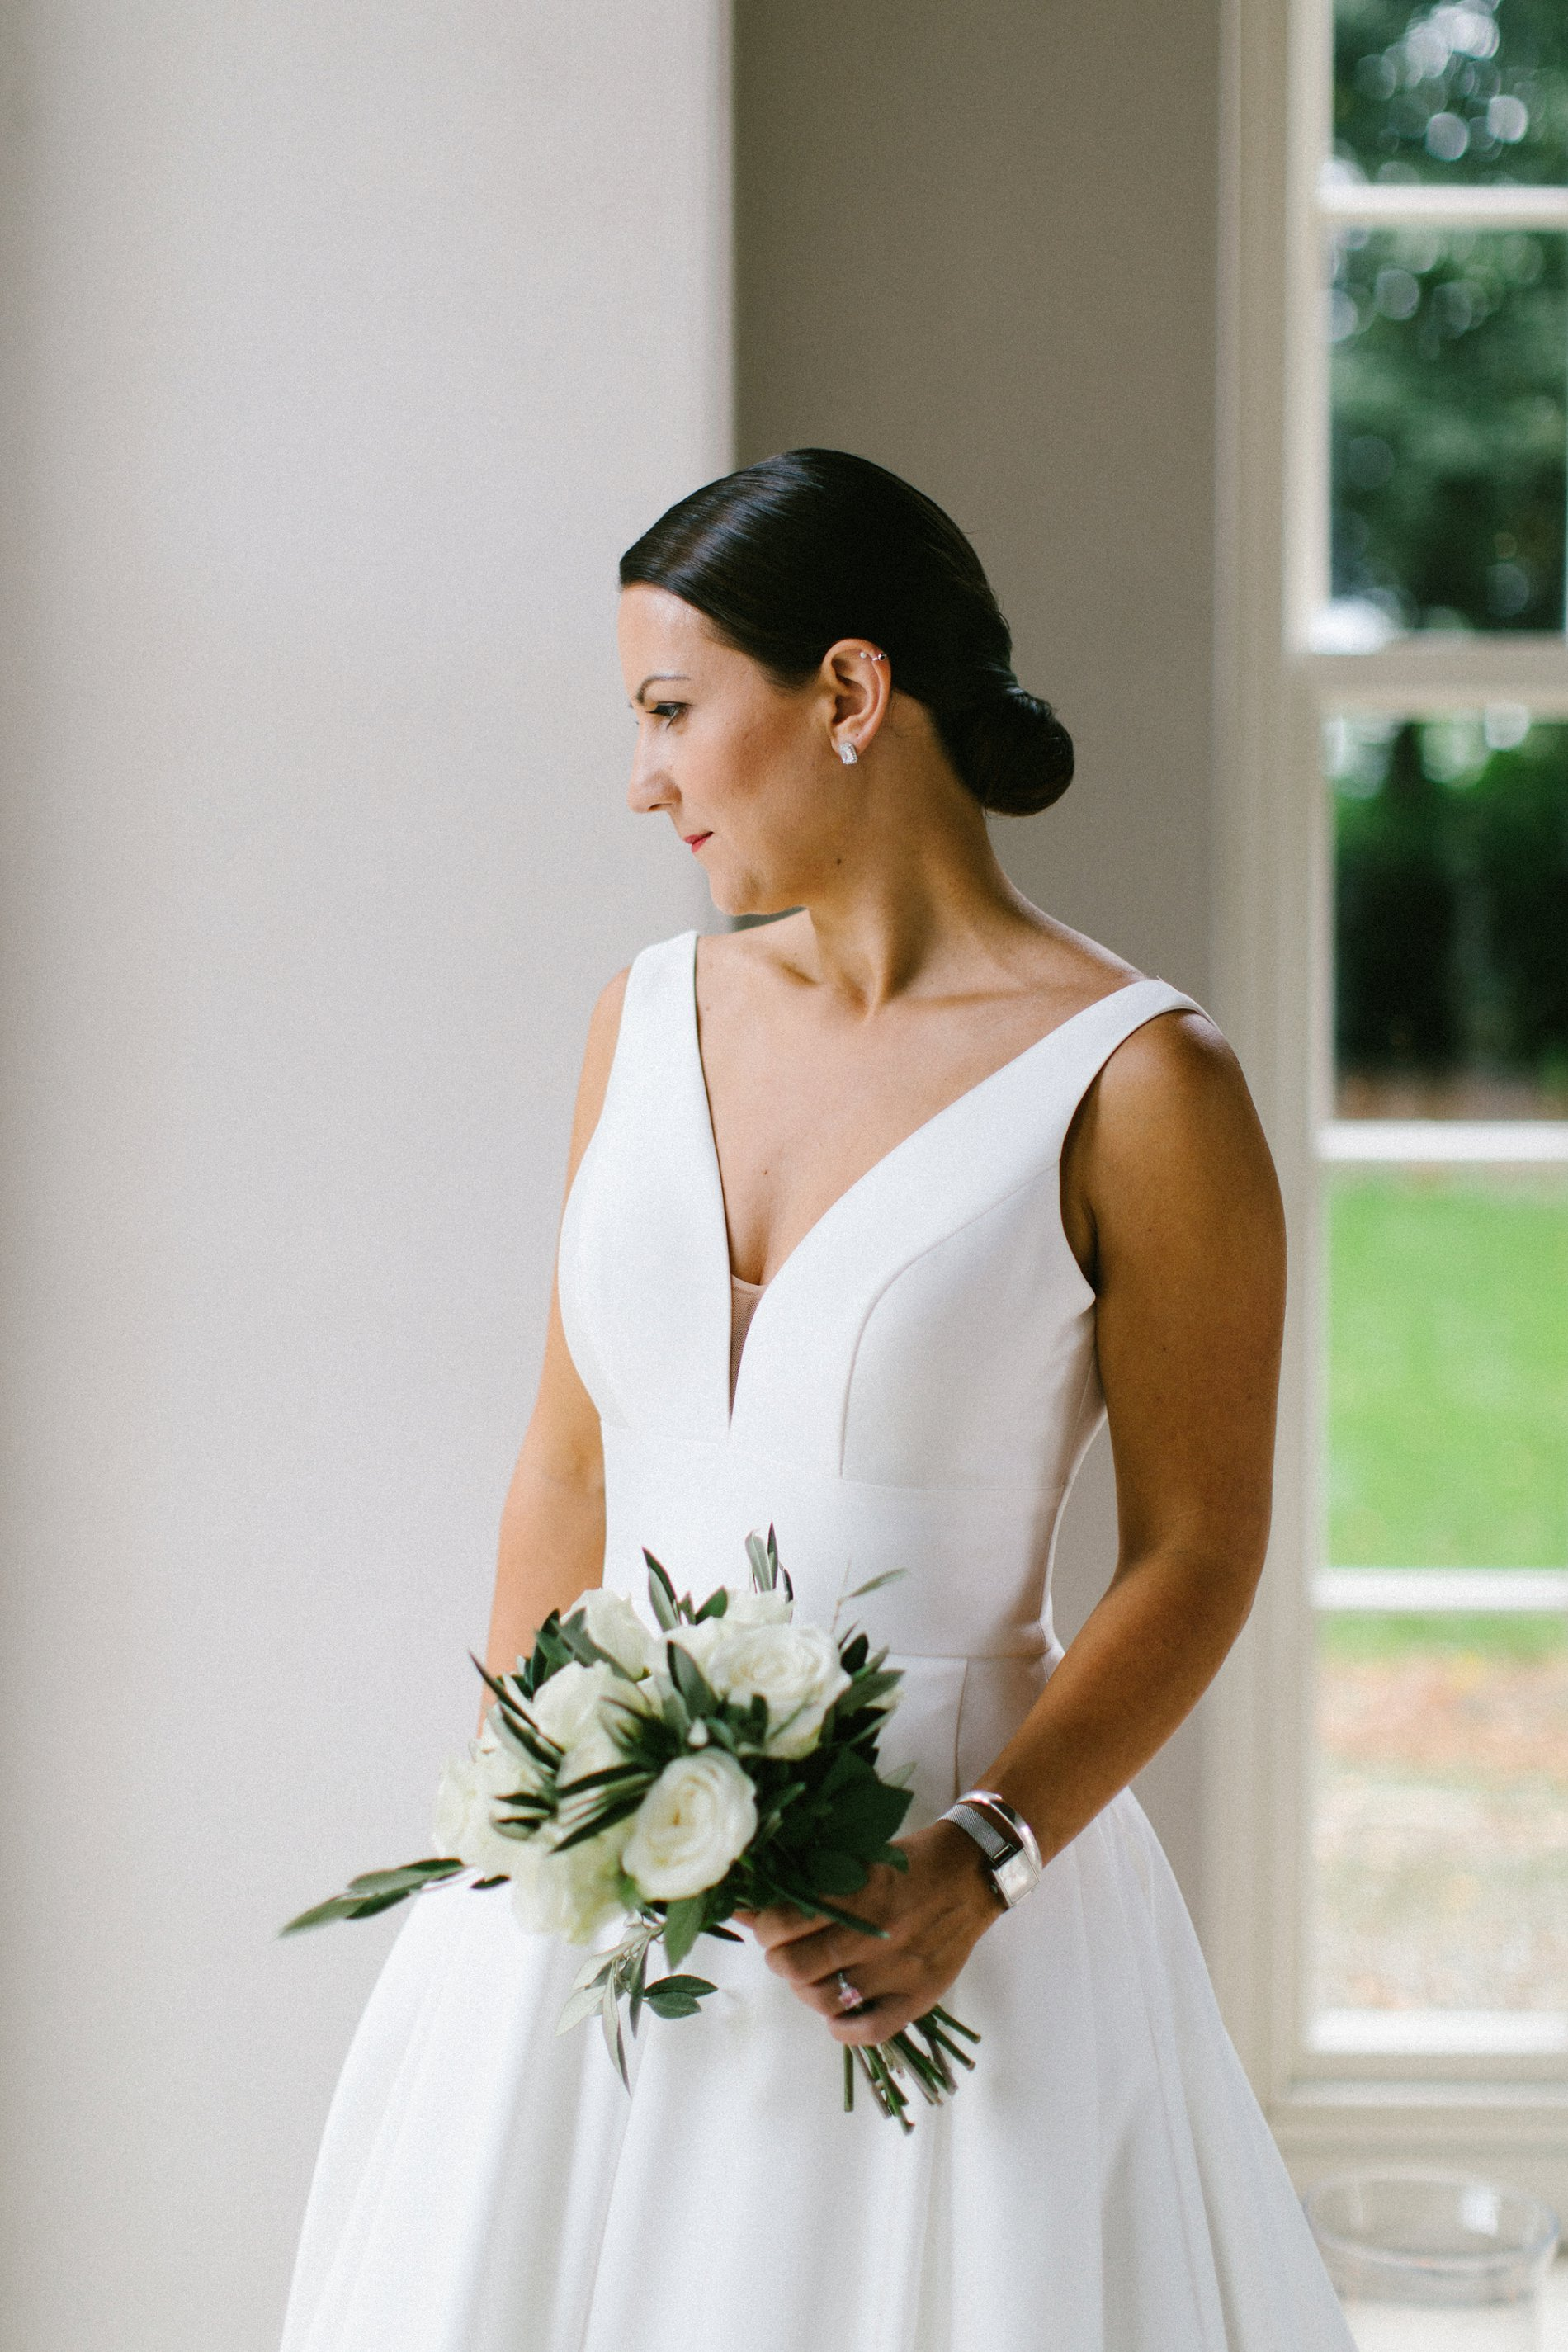 An Intimate Fine Art Wedding Shoot at Newby Hall (c) Melissa Beattie Photography (6)